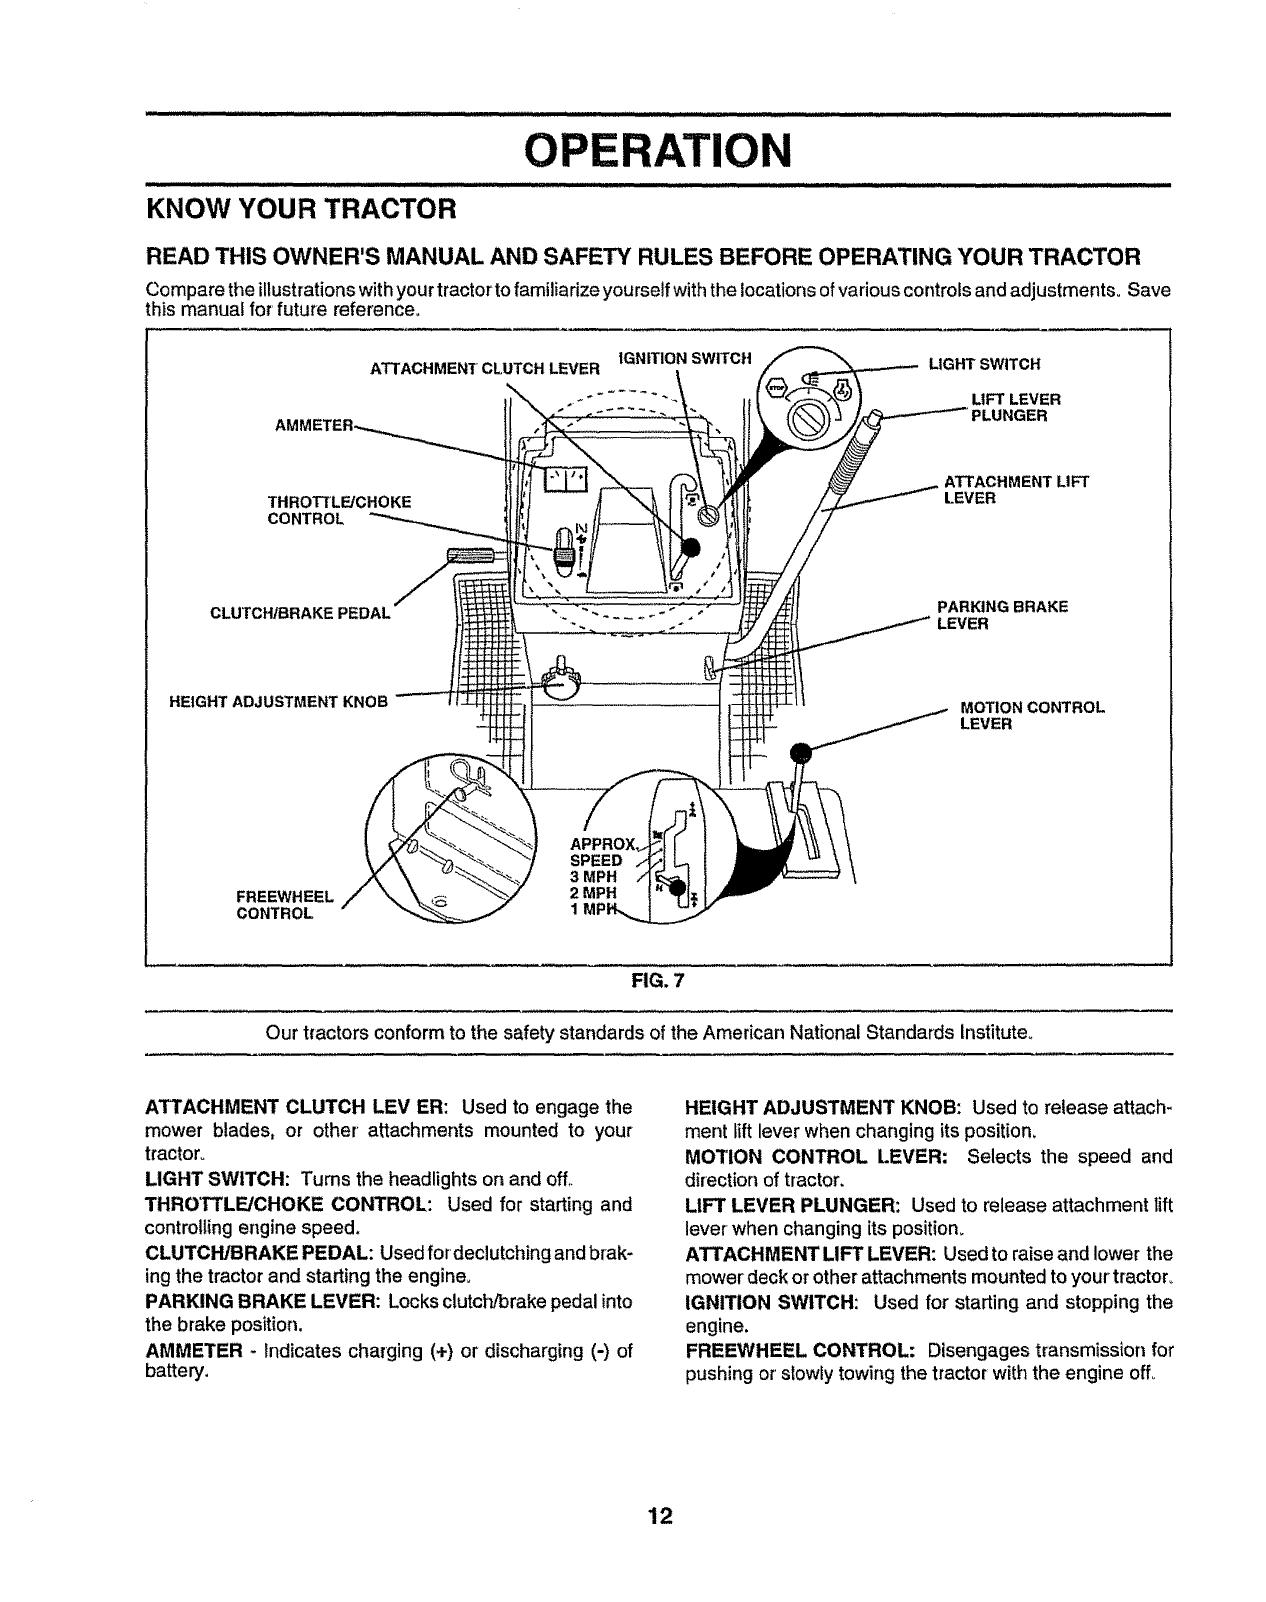 Kohler Courage 20 Throttle Linkage Diagram